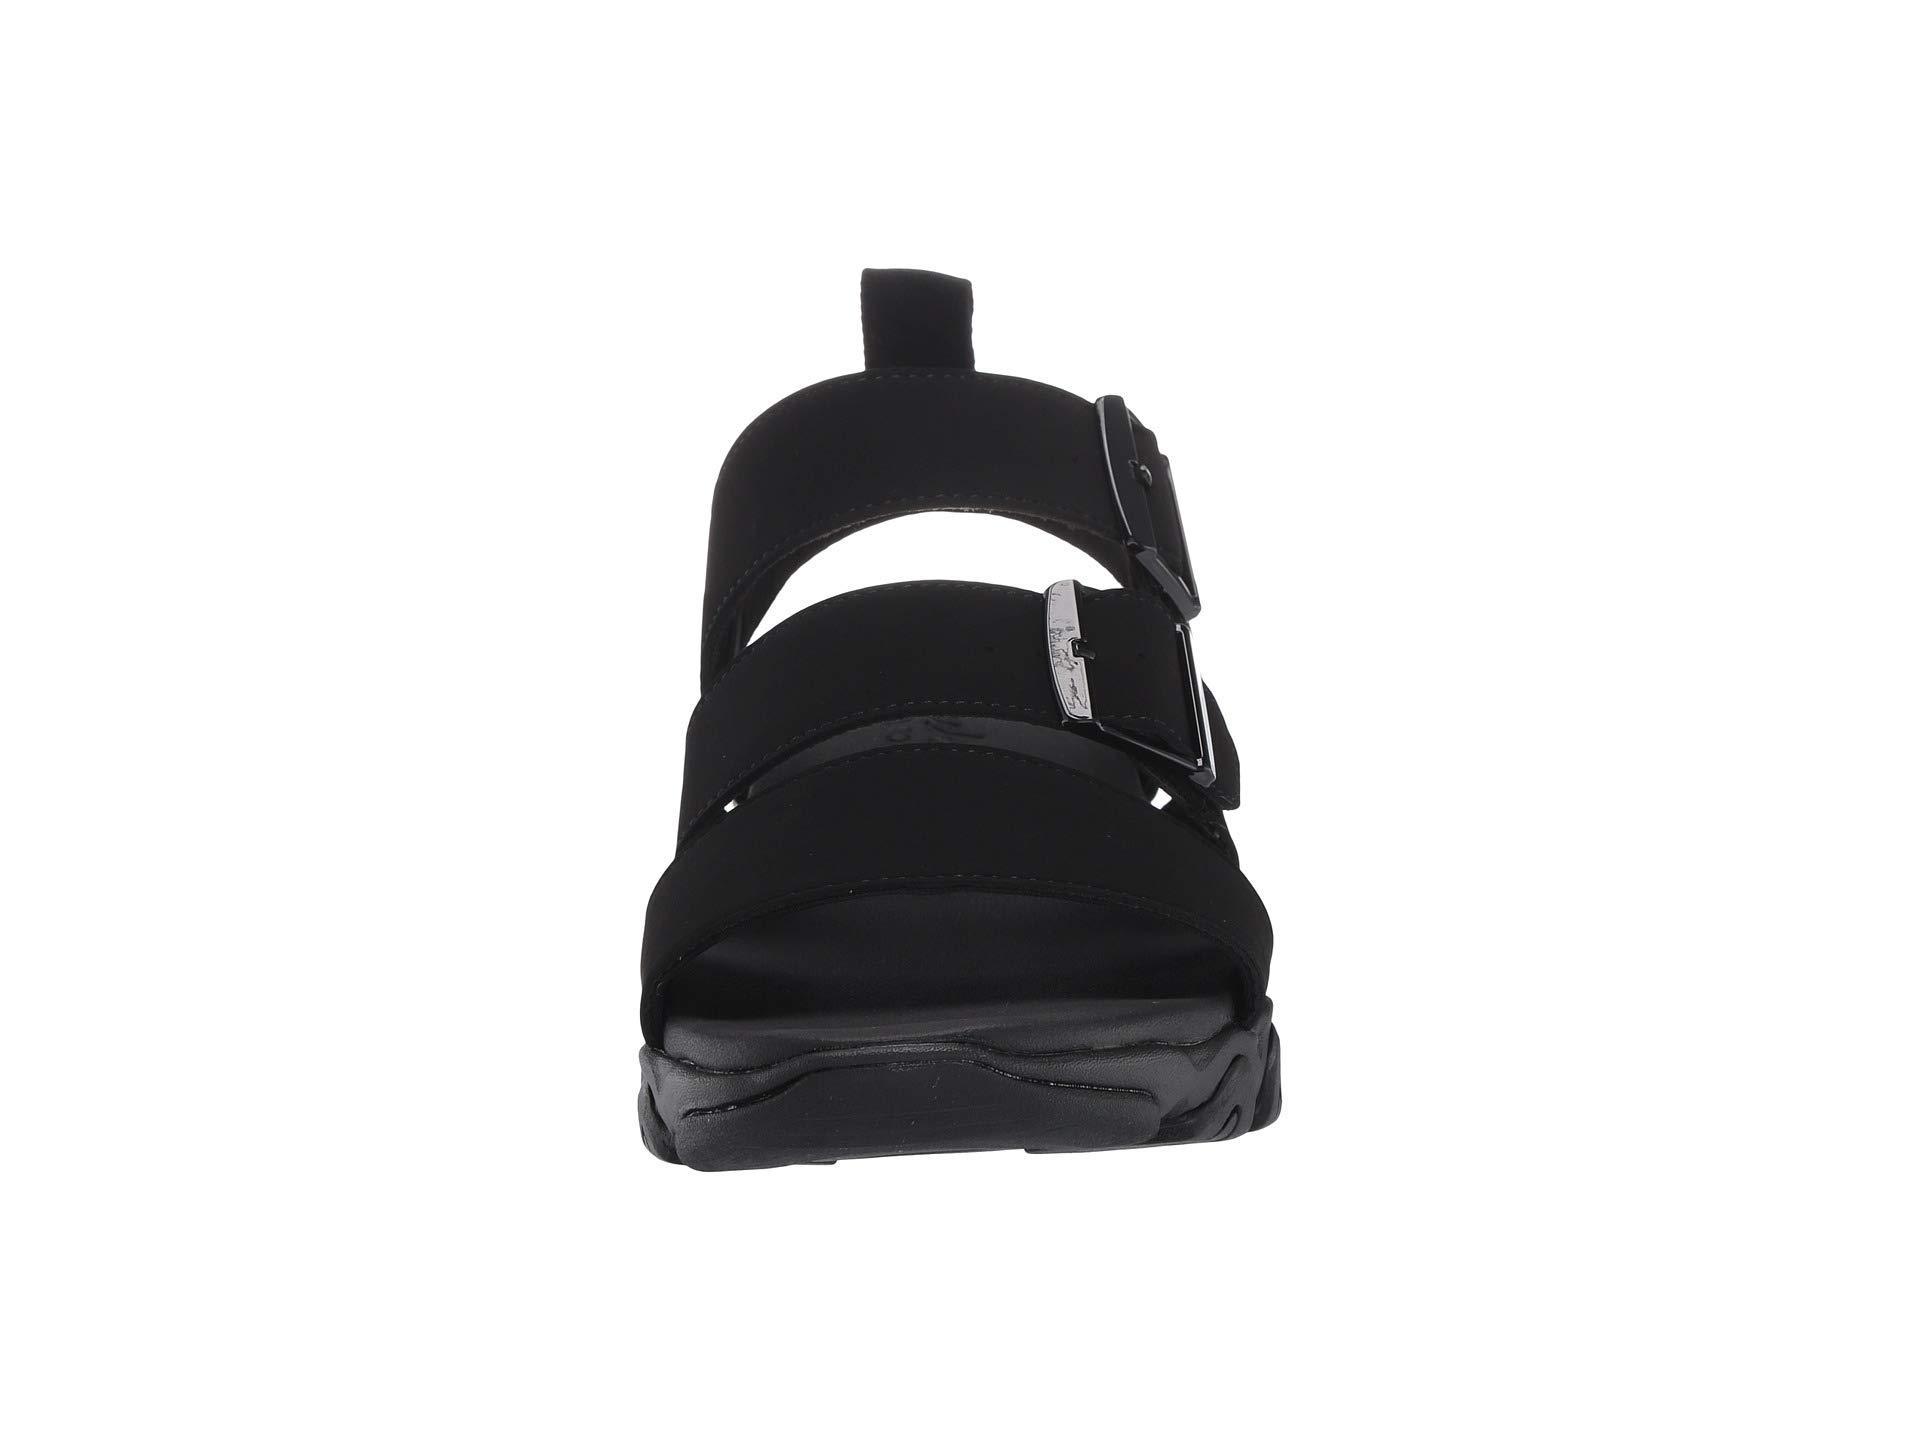 59e0b5db6 Skechers - D lites 2.0 - Cool Cosmos (black black) Women s Sandals. View  fullscreen